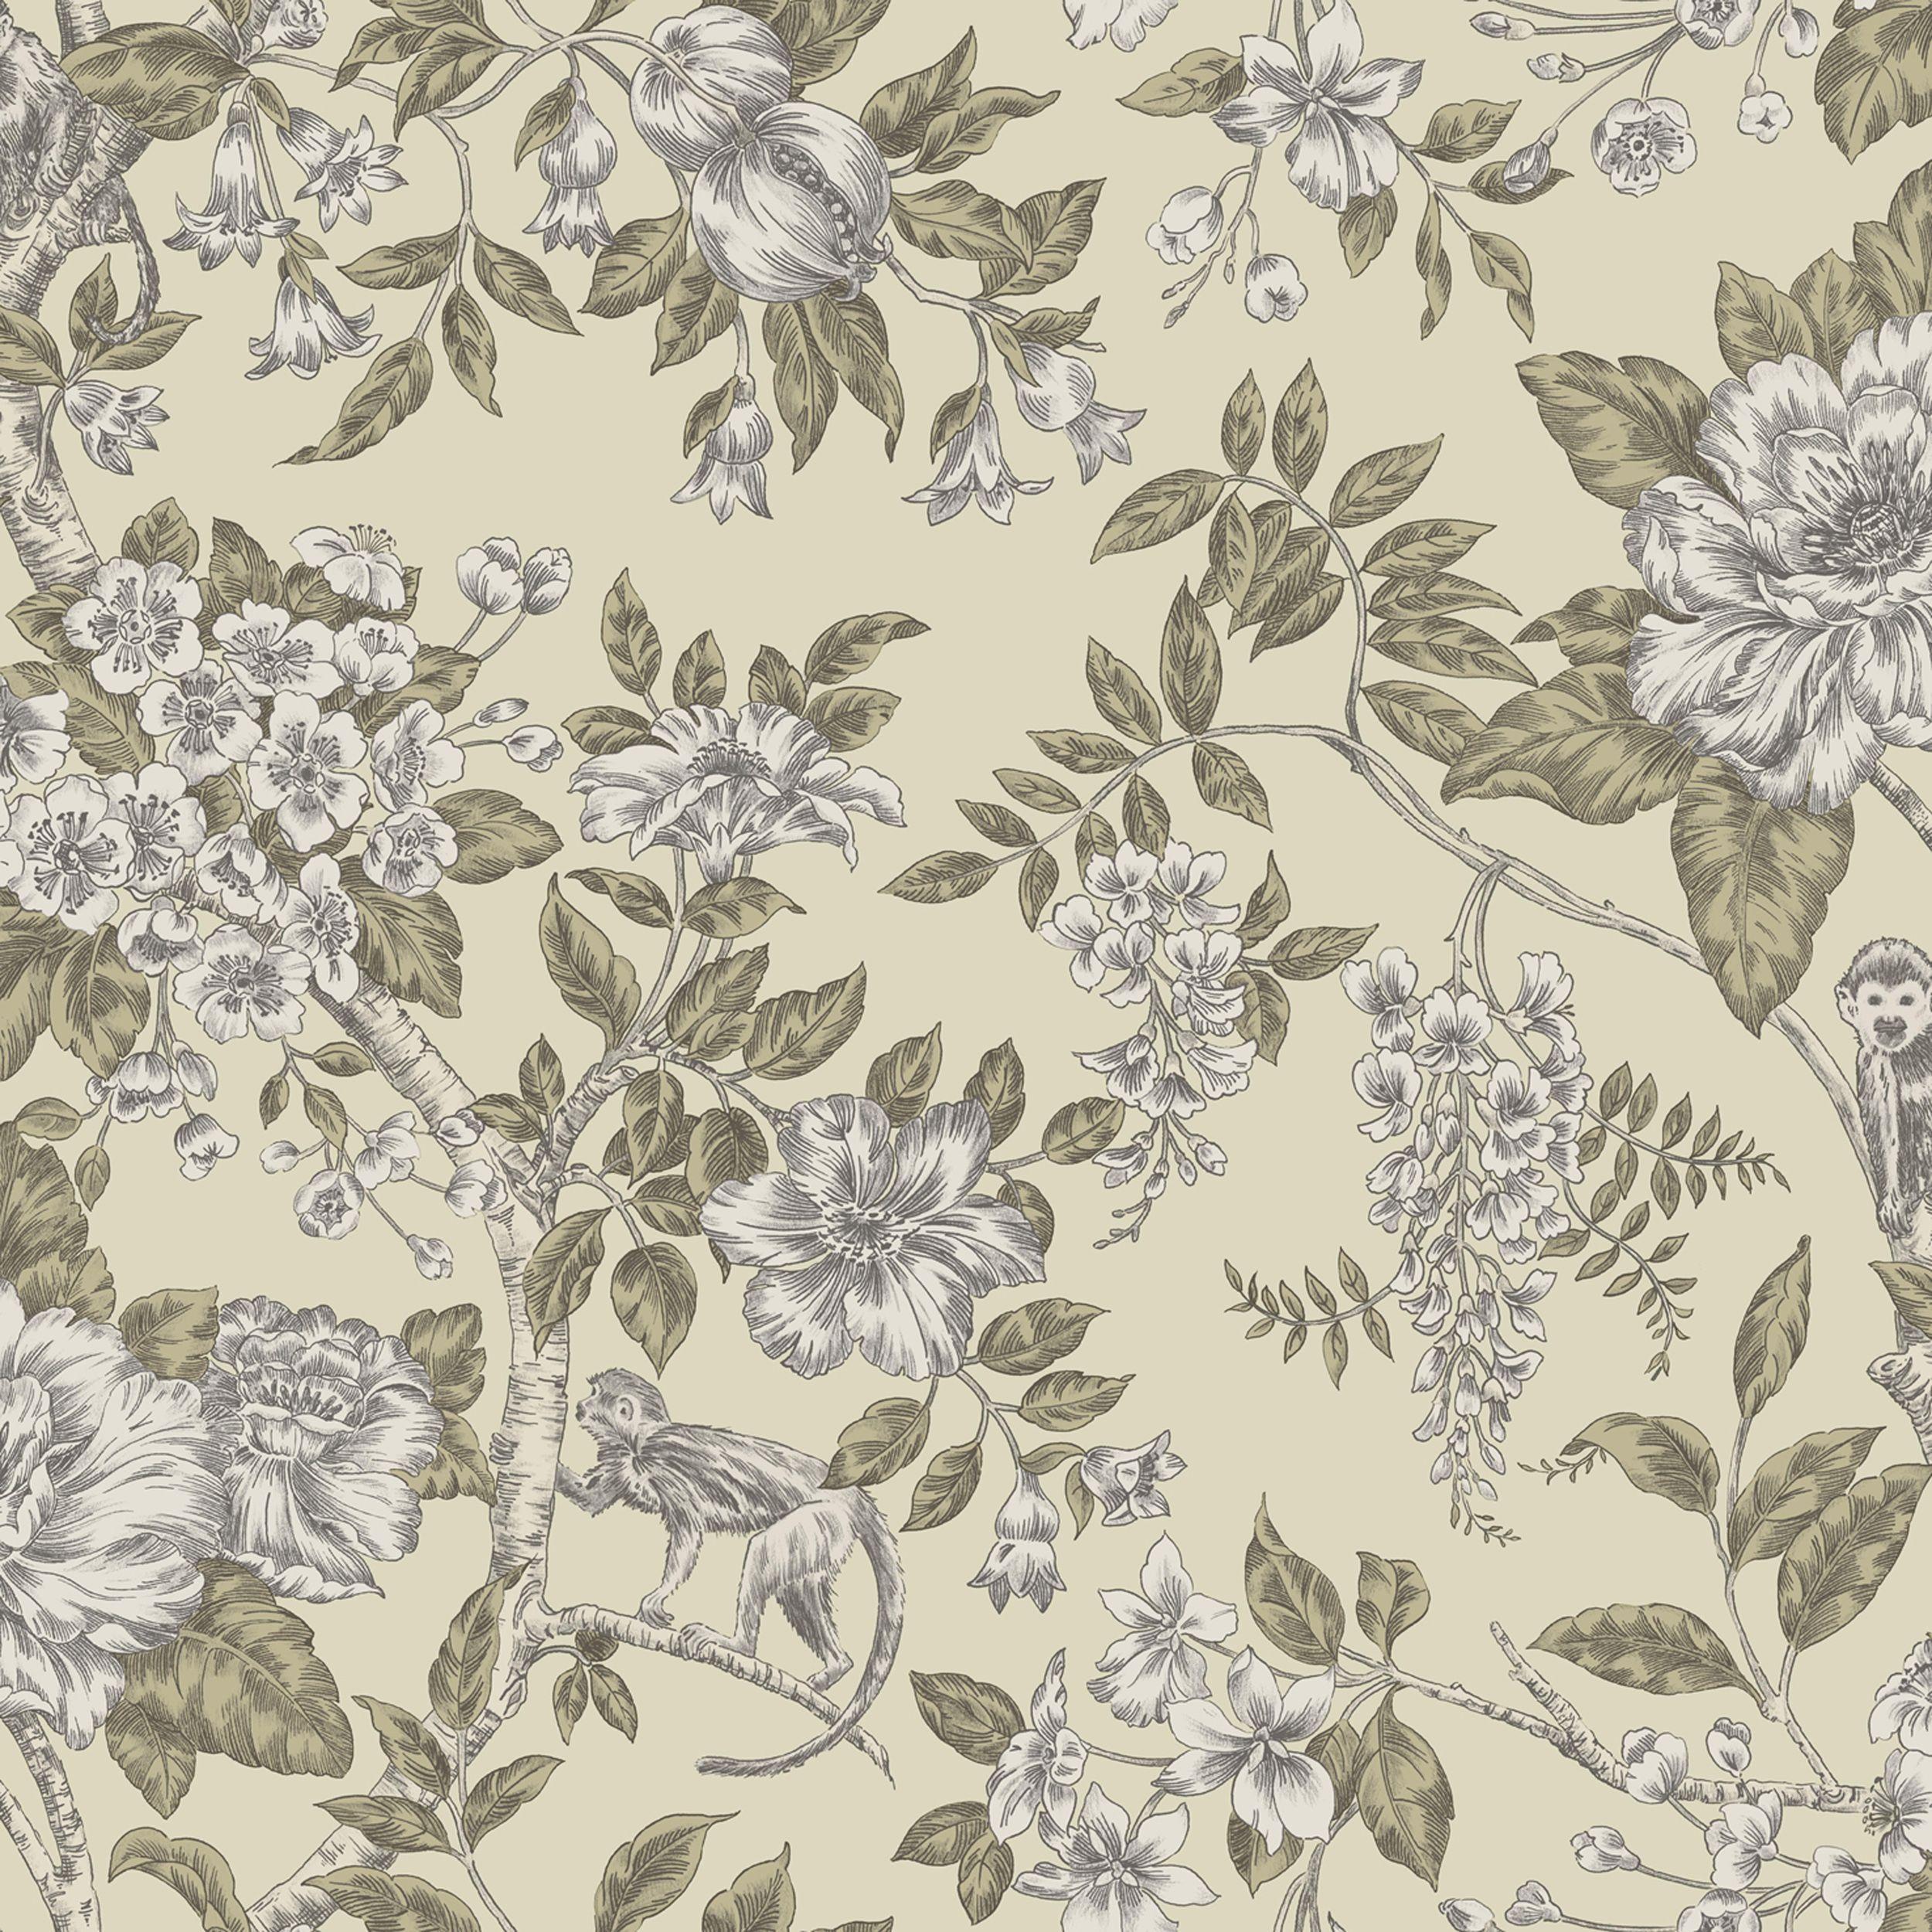 Home diy wallpaper illustration arthouse imagine fern plum motif vinyl - Statement Sumatra Cream Floral Wallpaper Floral Wallpapershome Ideas